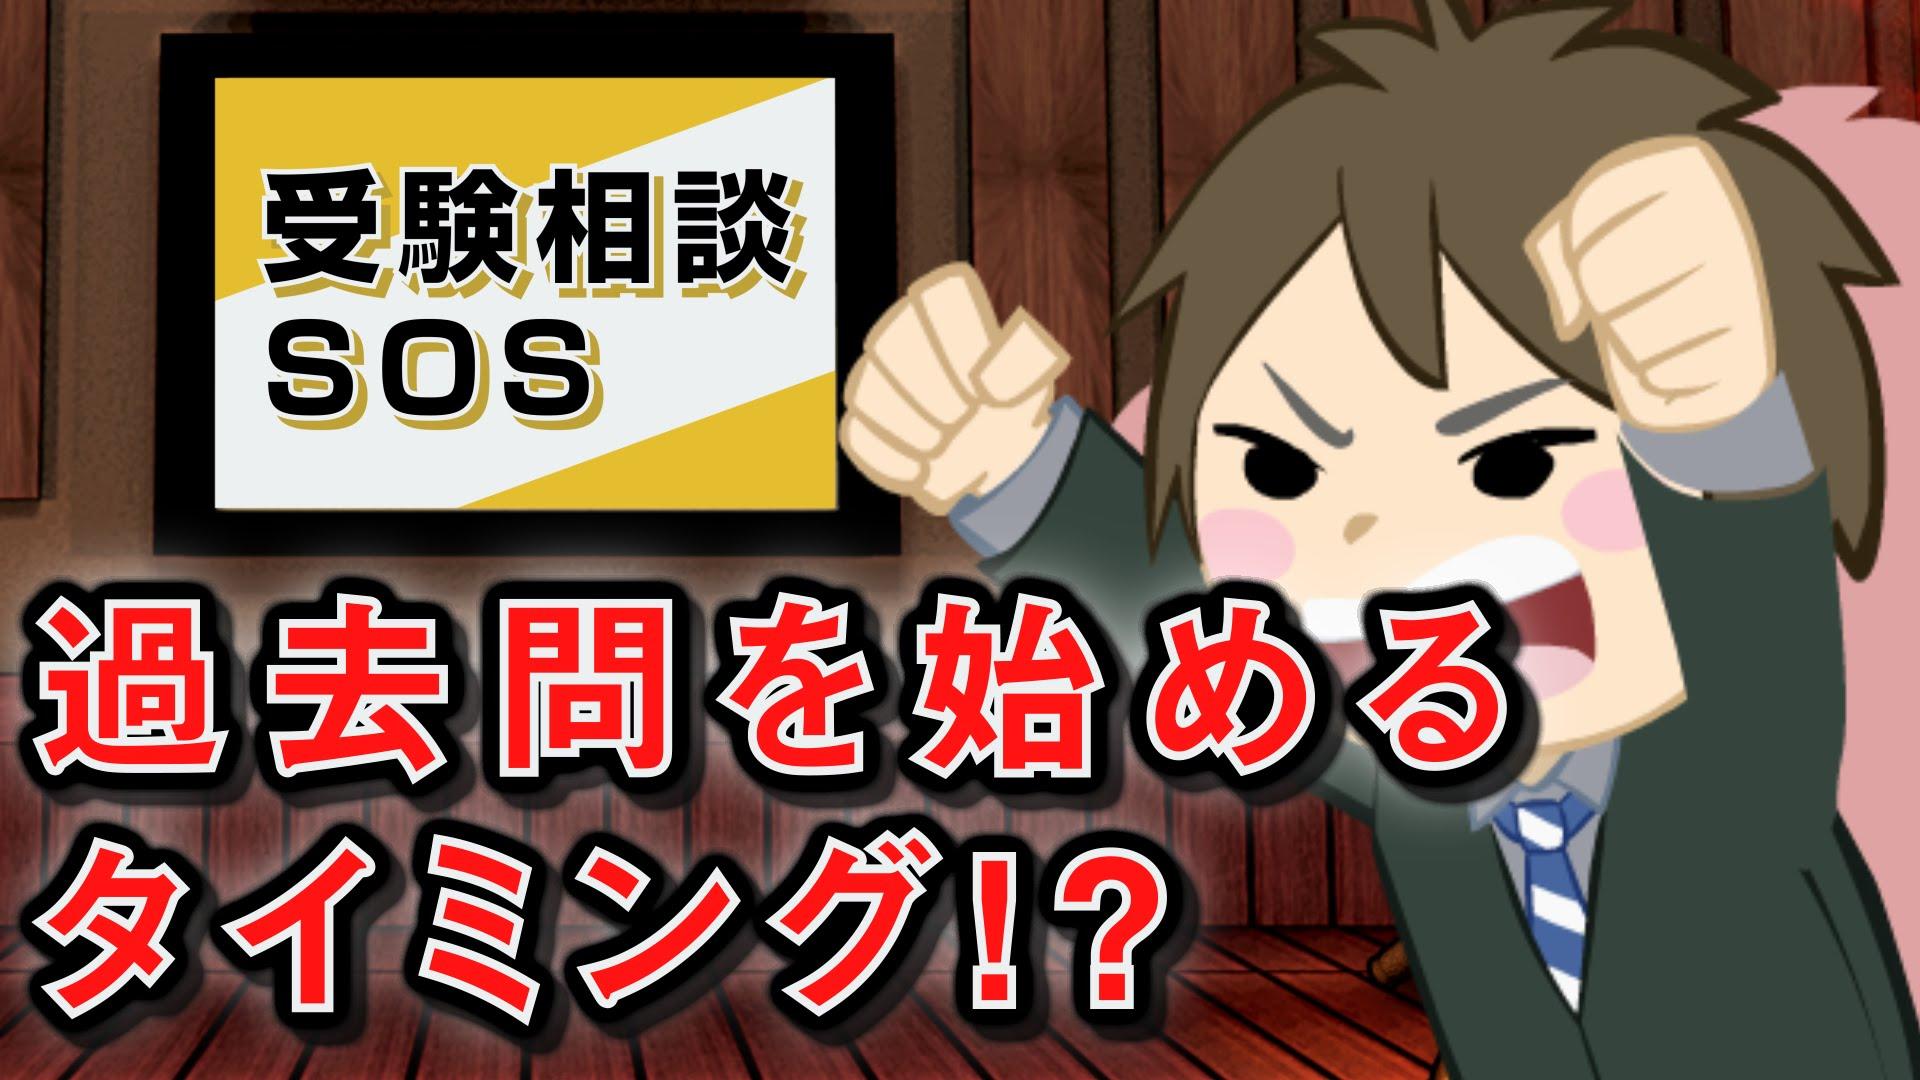 【vol.50】過去問を始めるタイミング!?|受験相談SOS